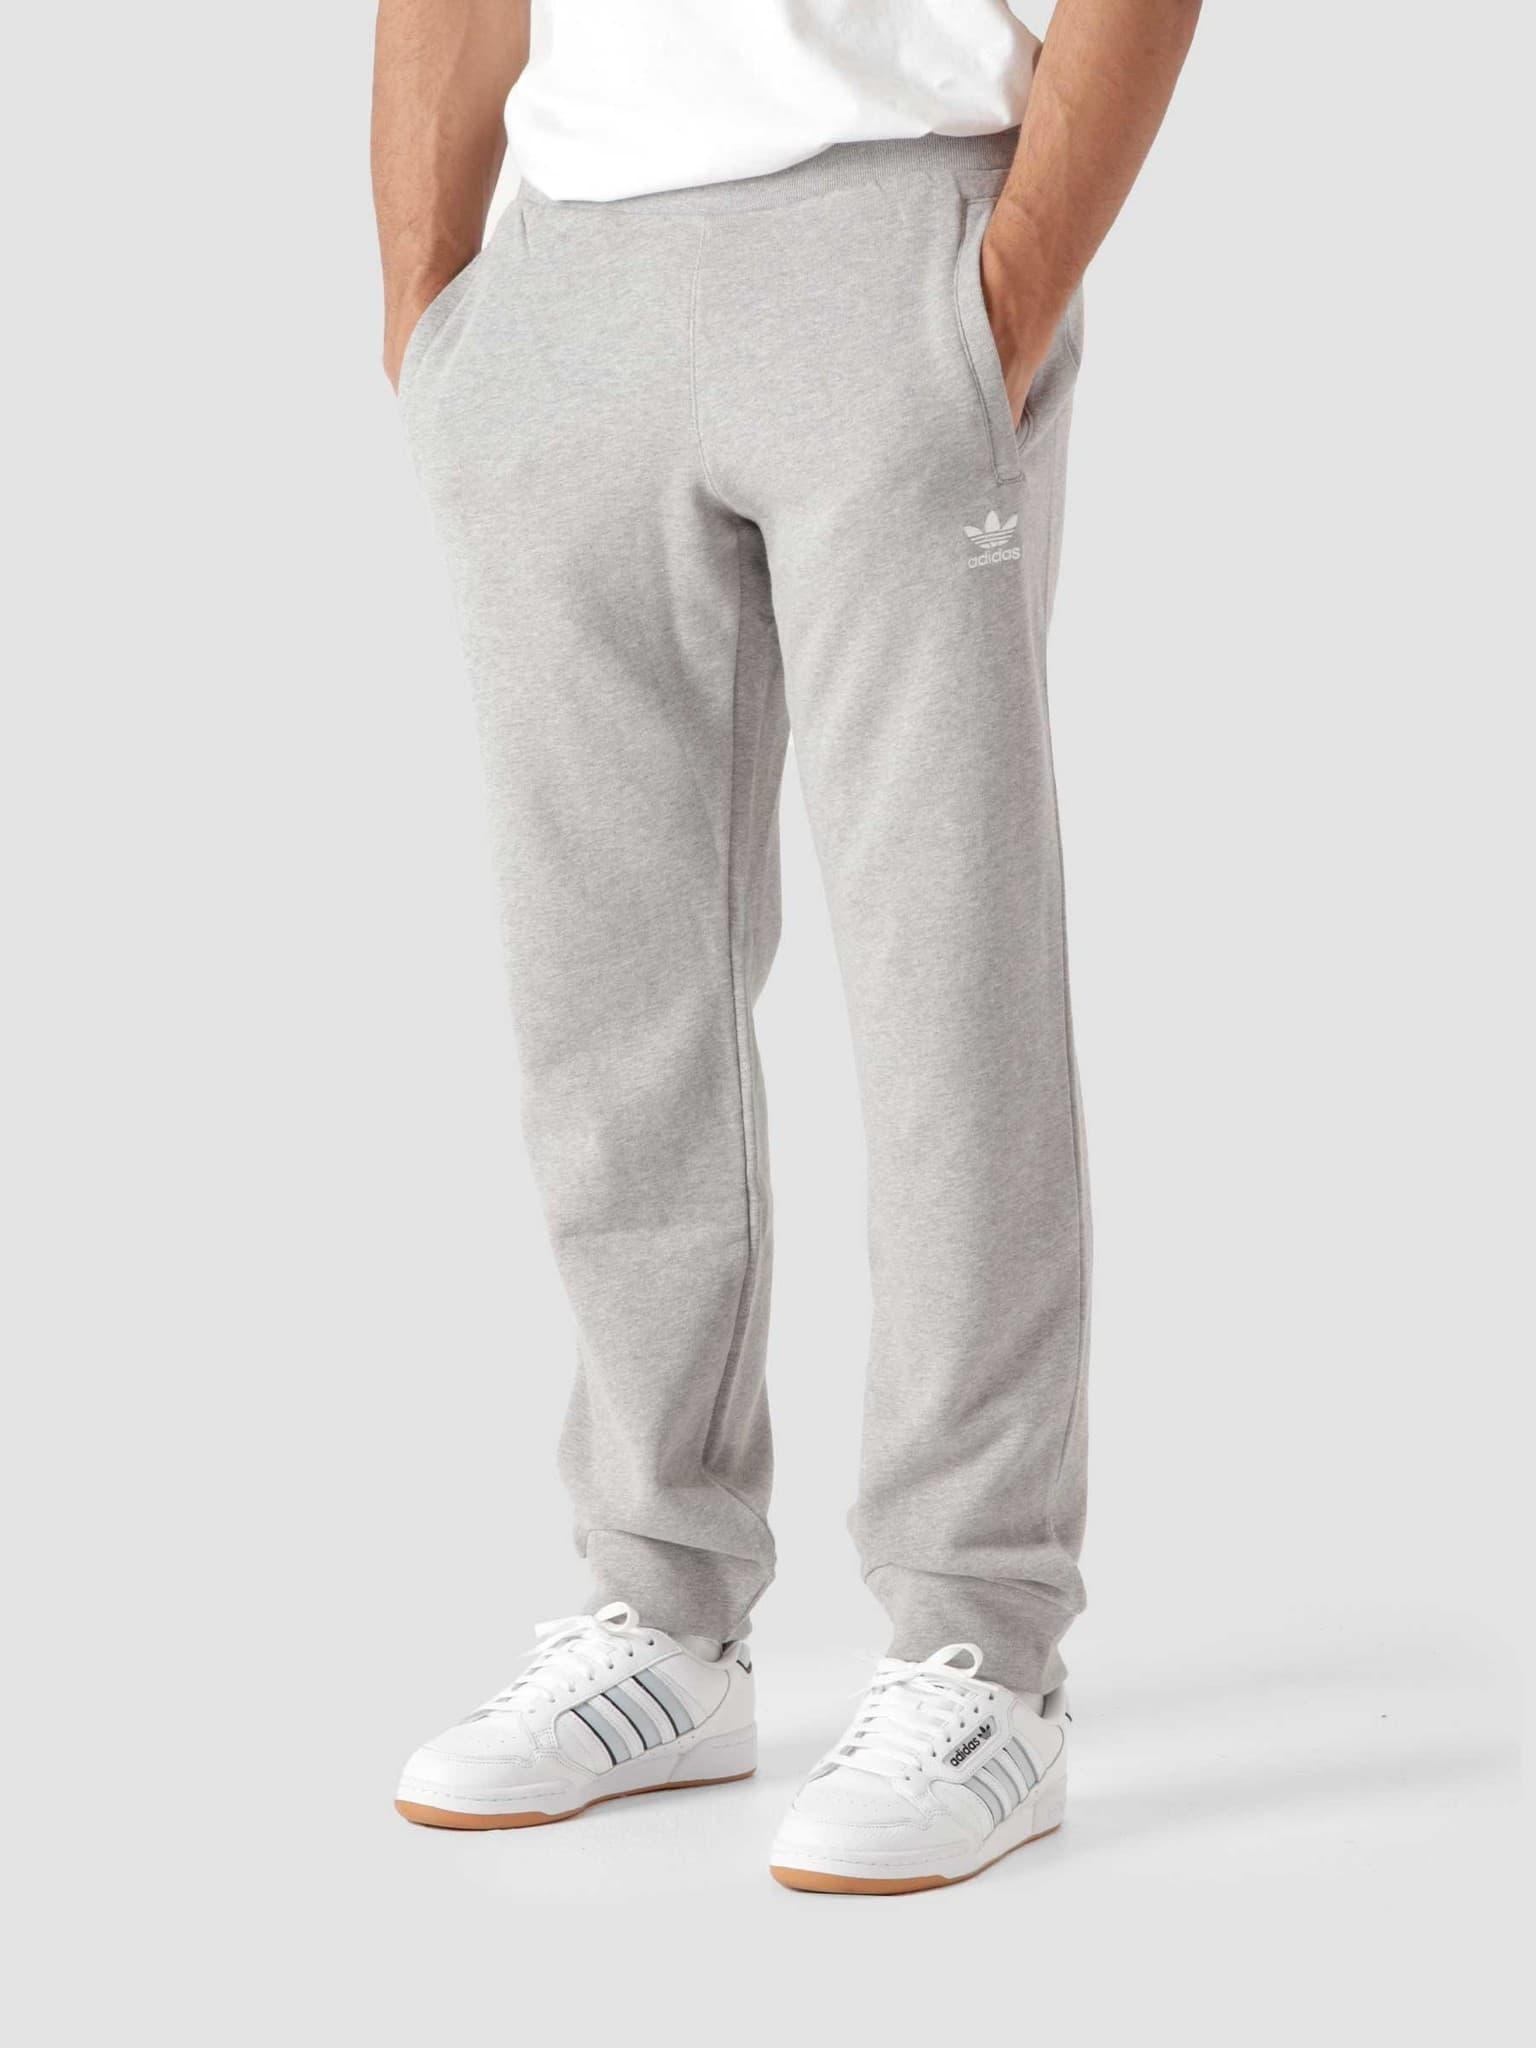 Trefoil Pant Grey DV1540